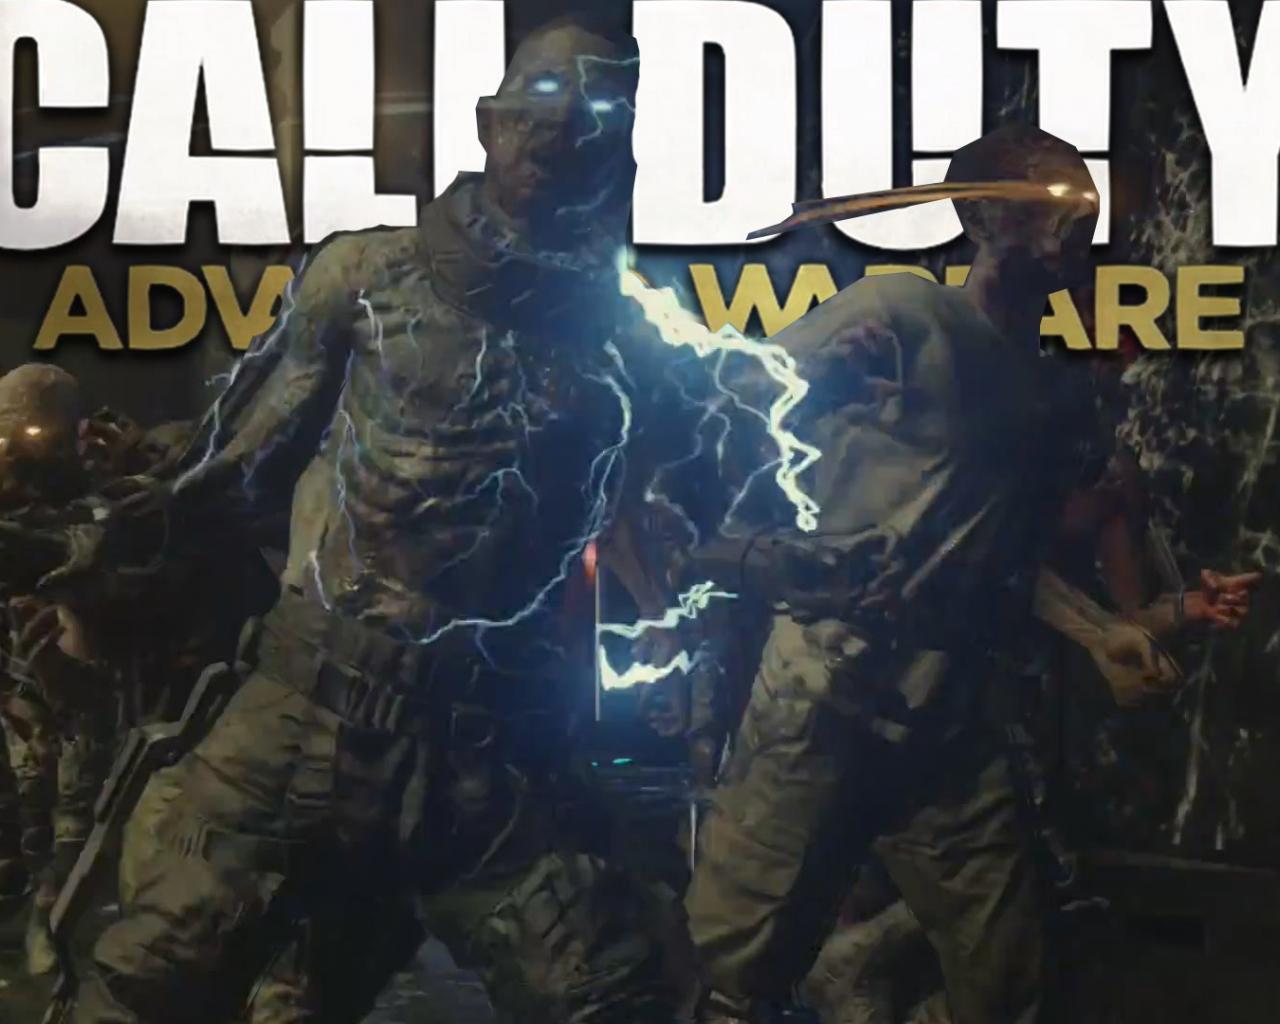 download Call of Duty Advanced Warfare EXO ZOMBIES TRAILER 1280x1024